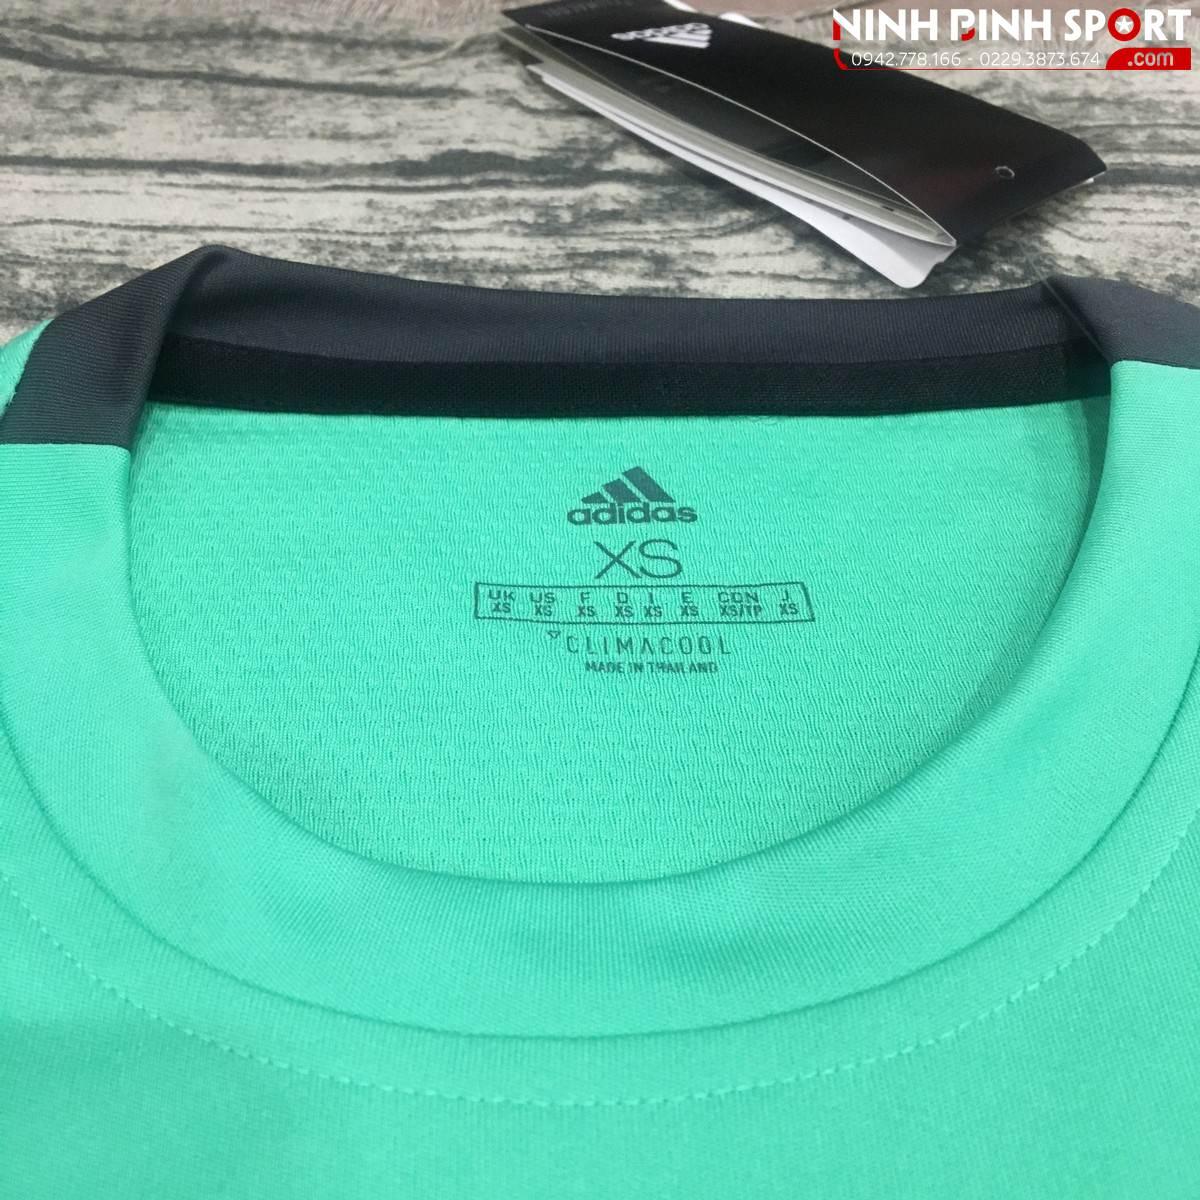 Adidas 3-Stripes Club Tee - Light Green CE1423